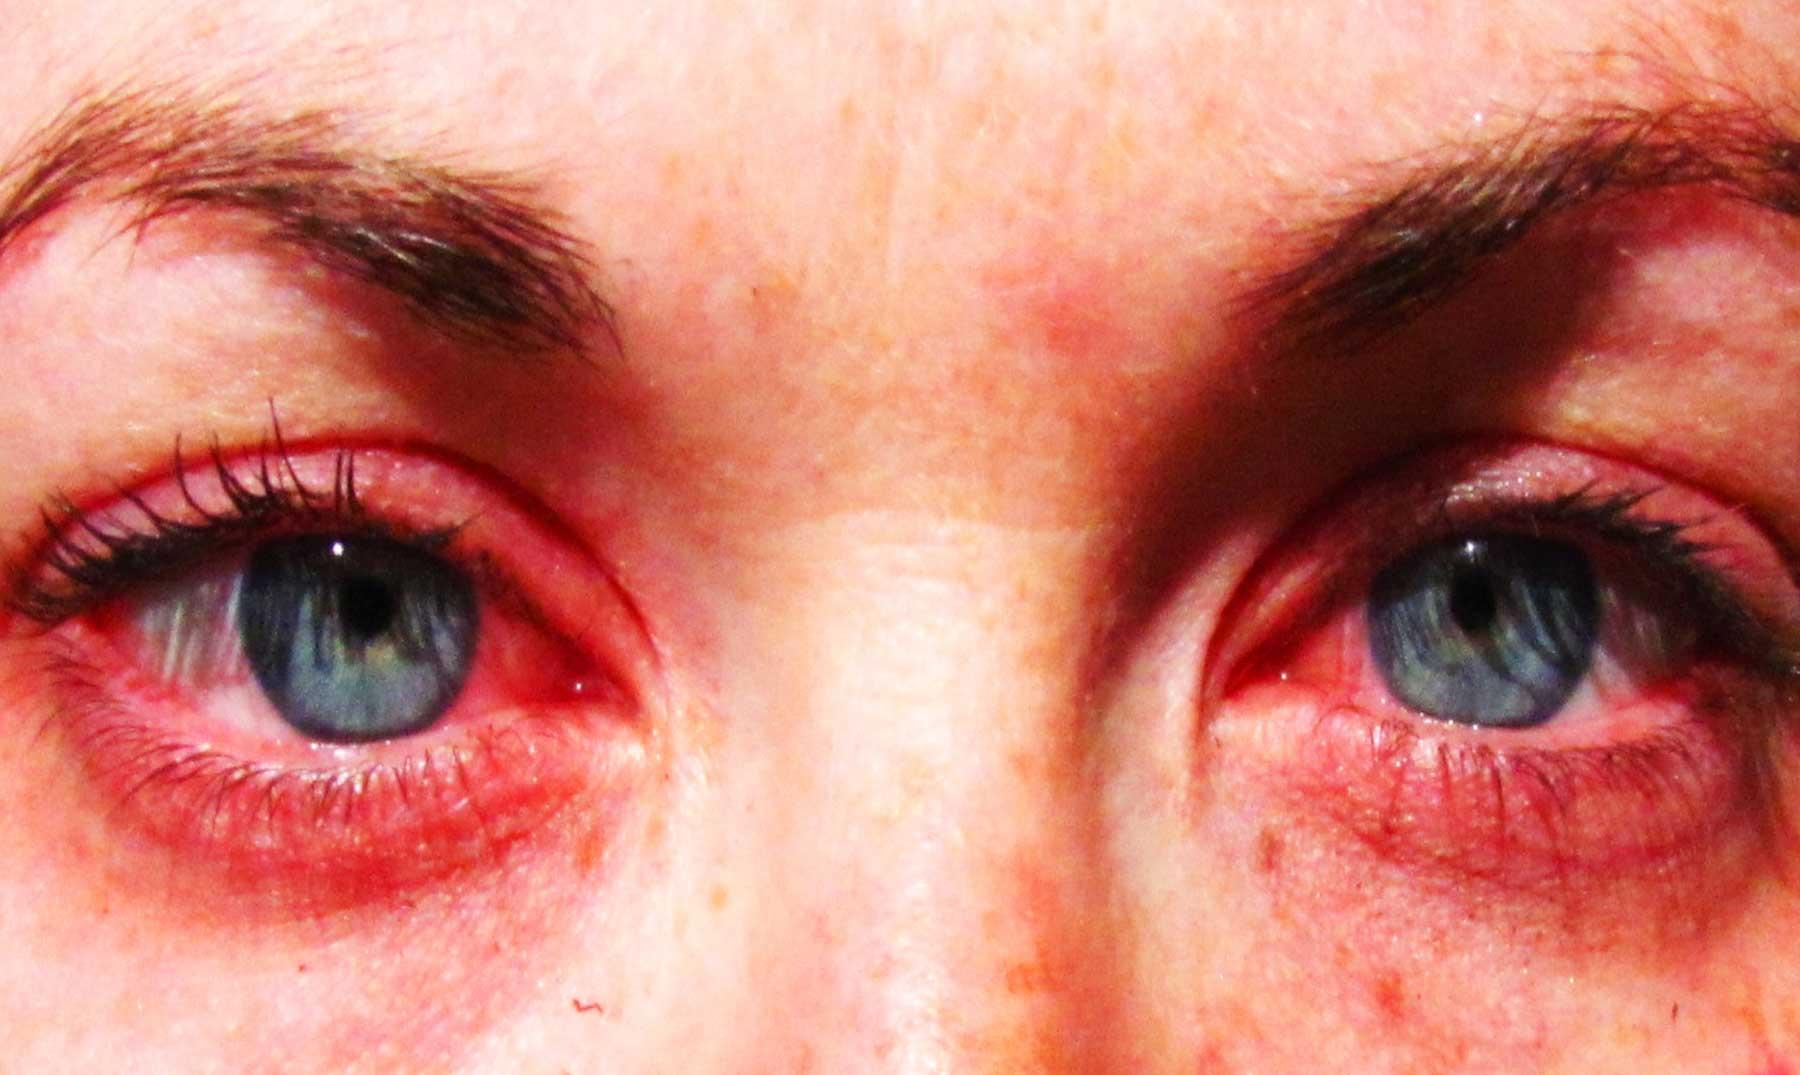 5 alergias súper extrañas. ¡Increíble!